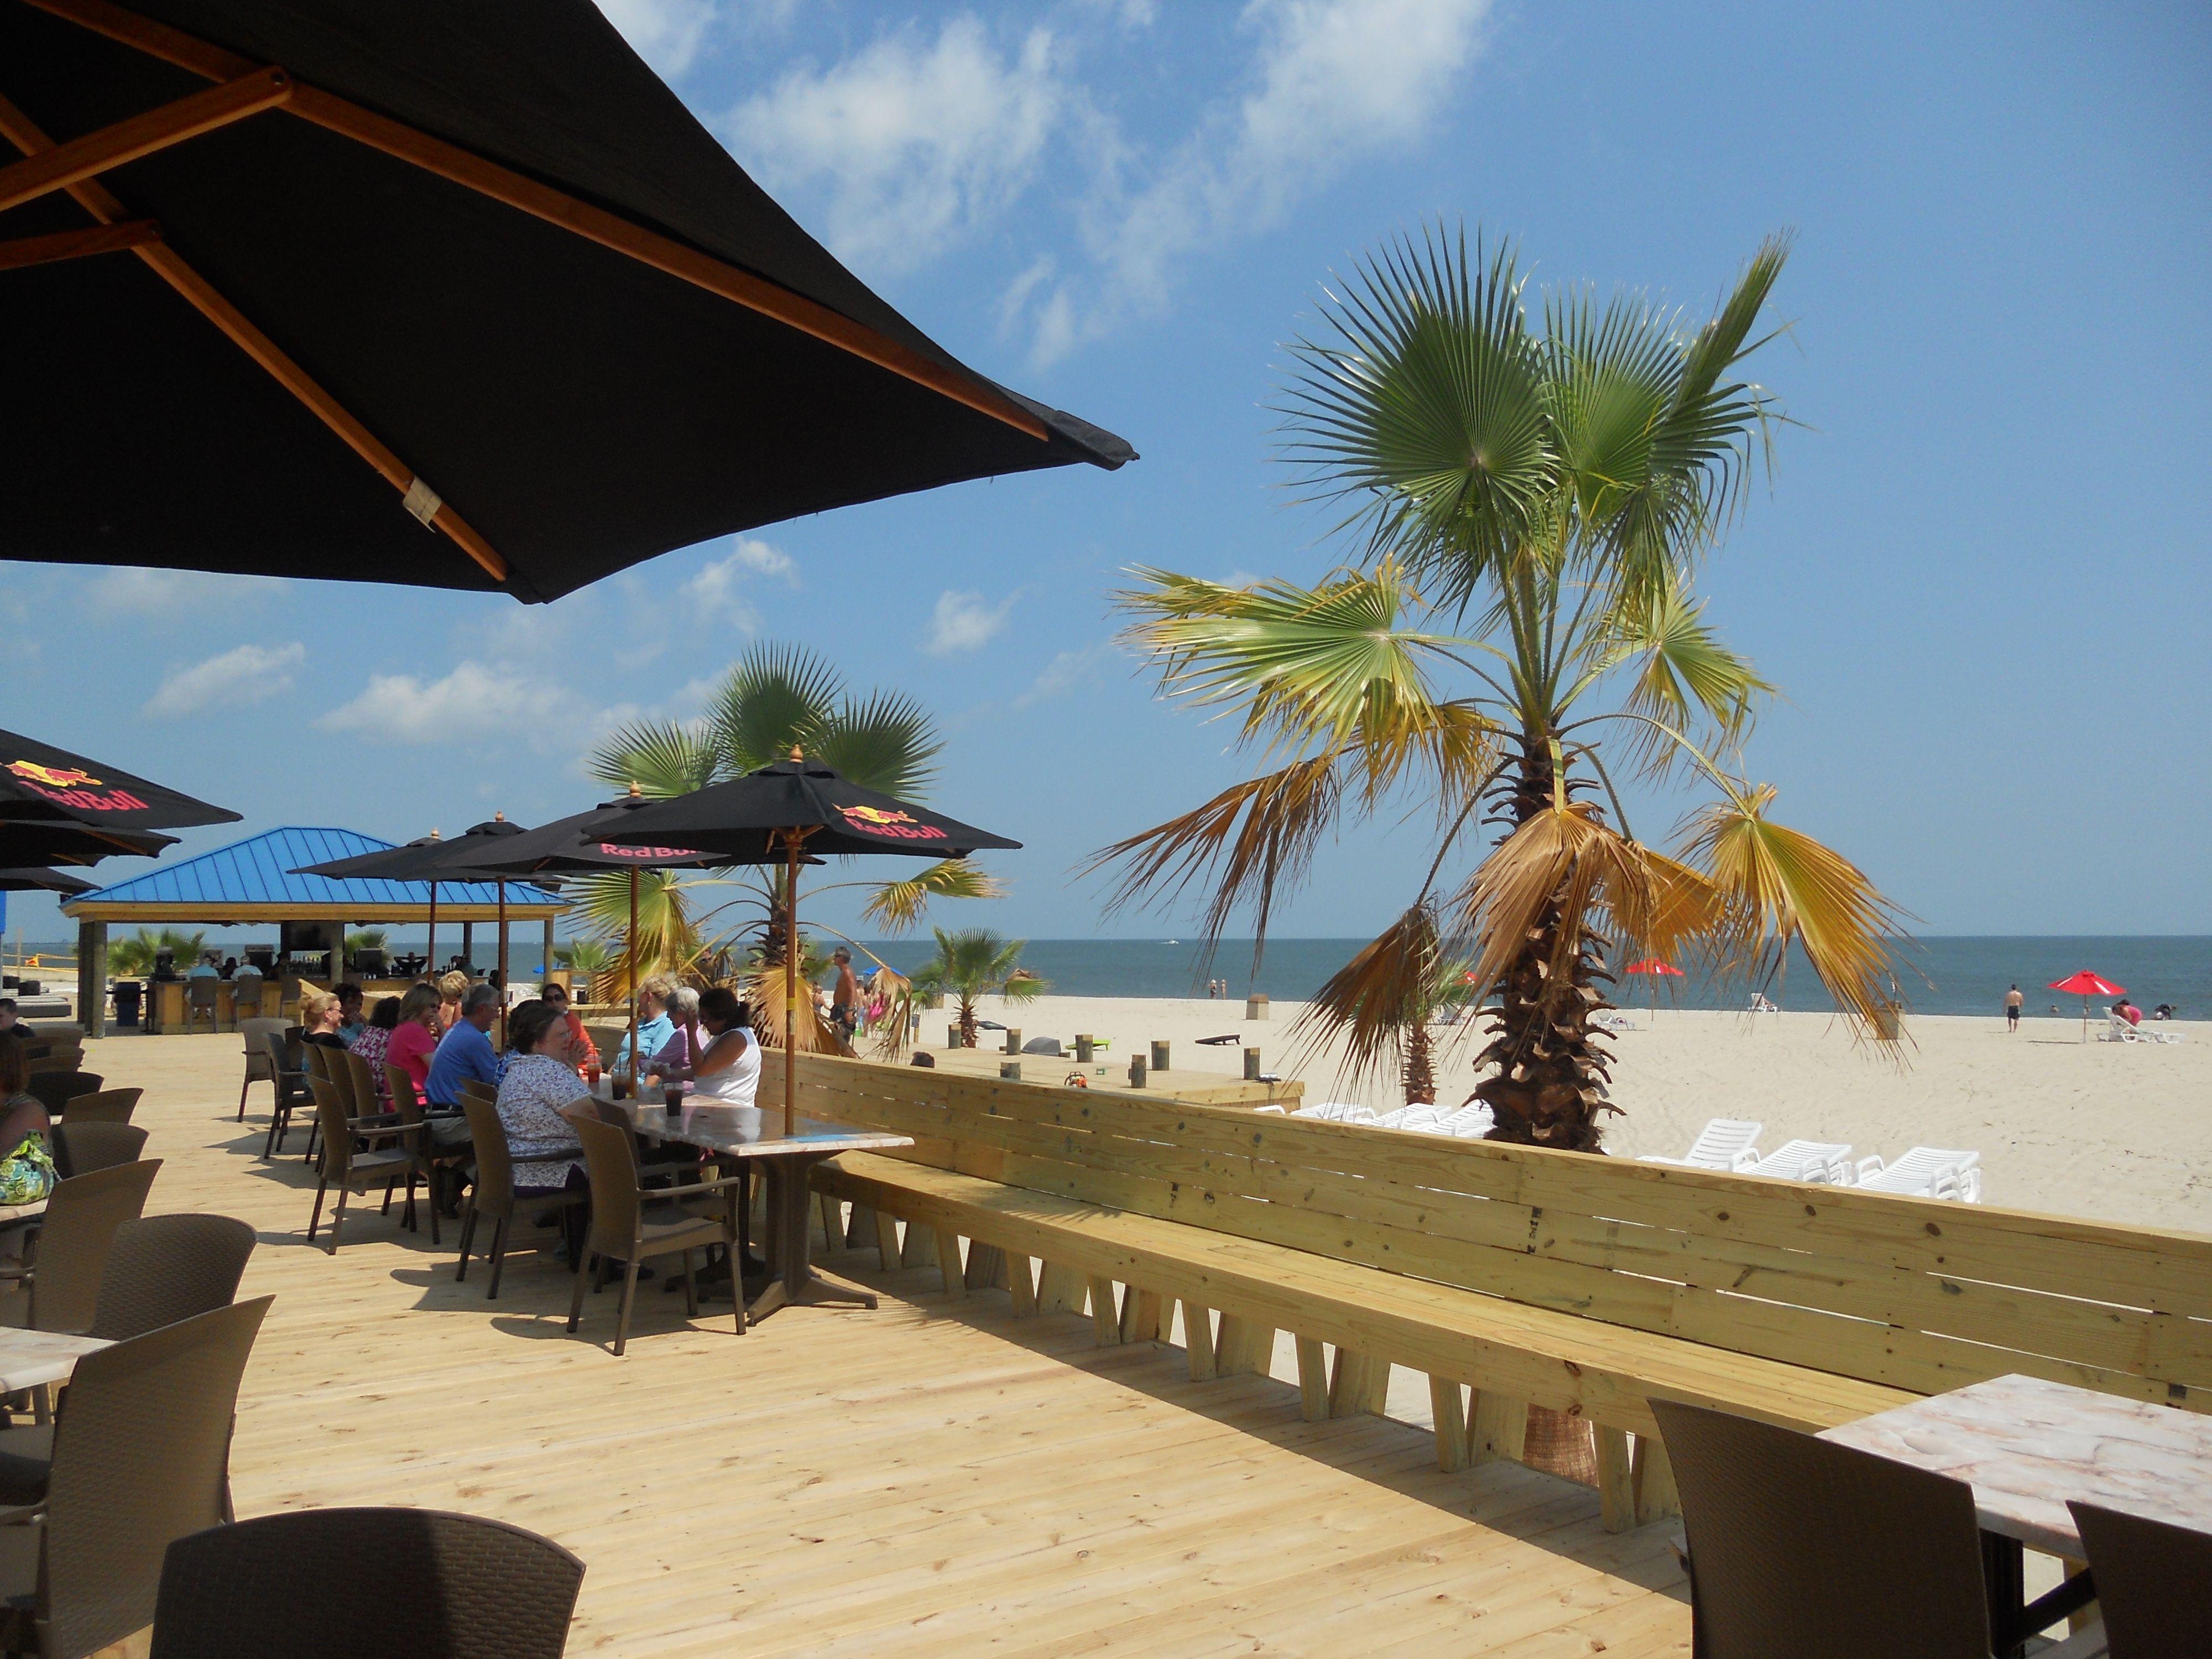 Paradise Ocean Club At Fort Monroe Http Www Paradiseoceanclub Com Virginia Vacation Beach Paradise City By The Sea